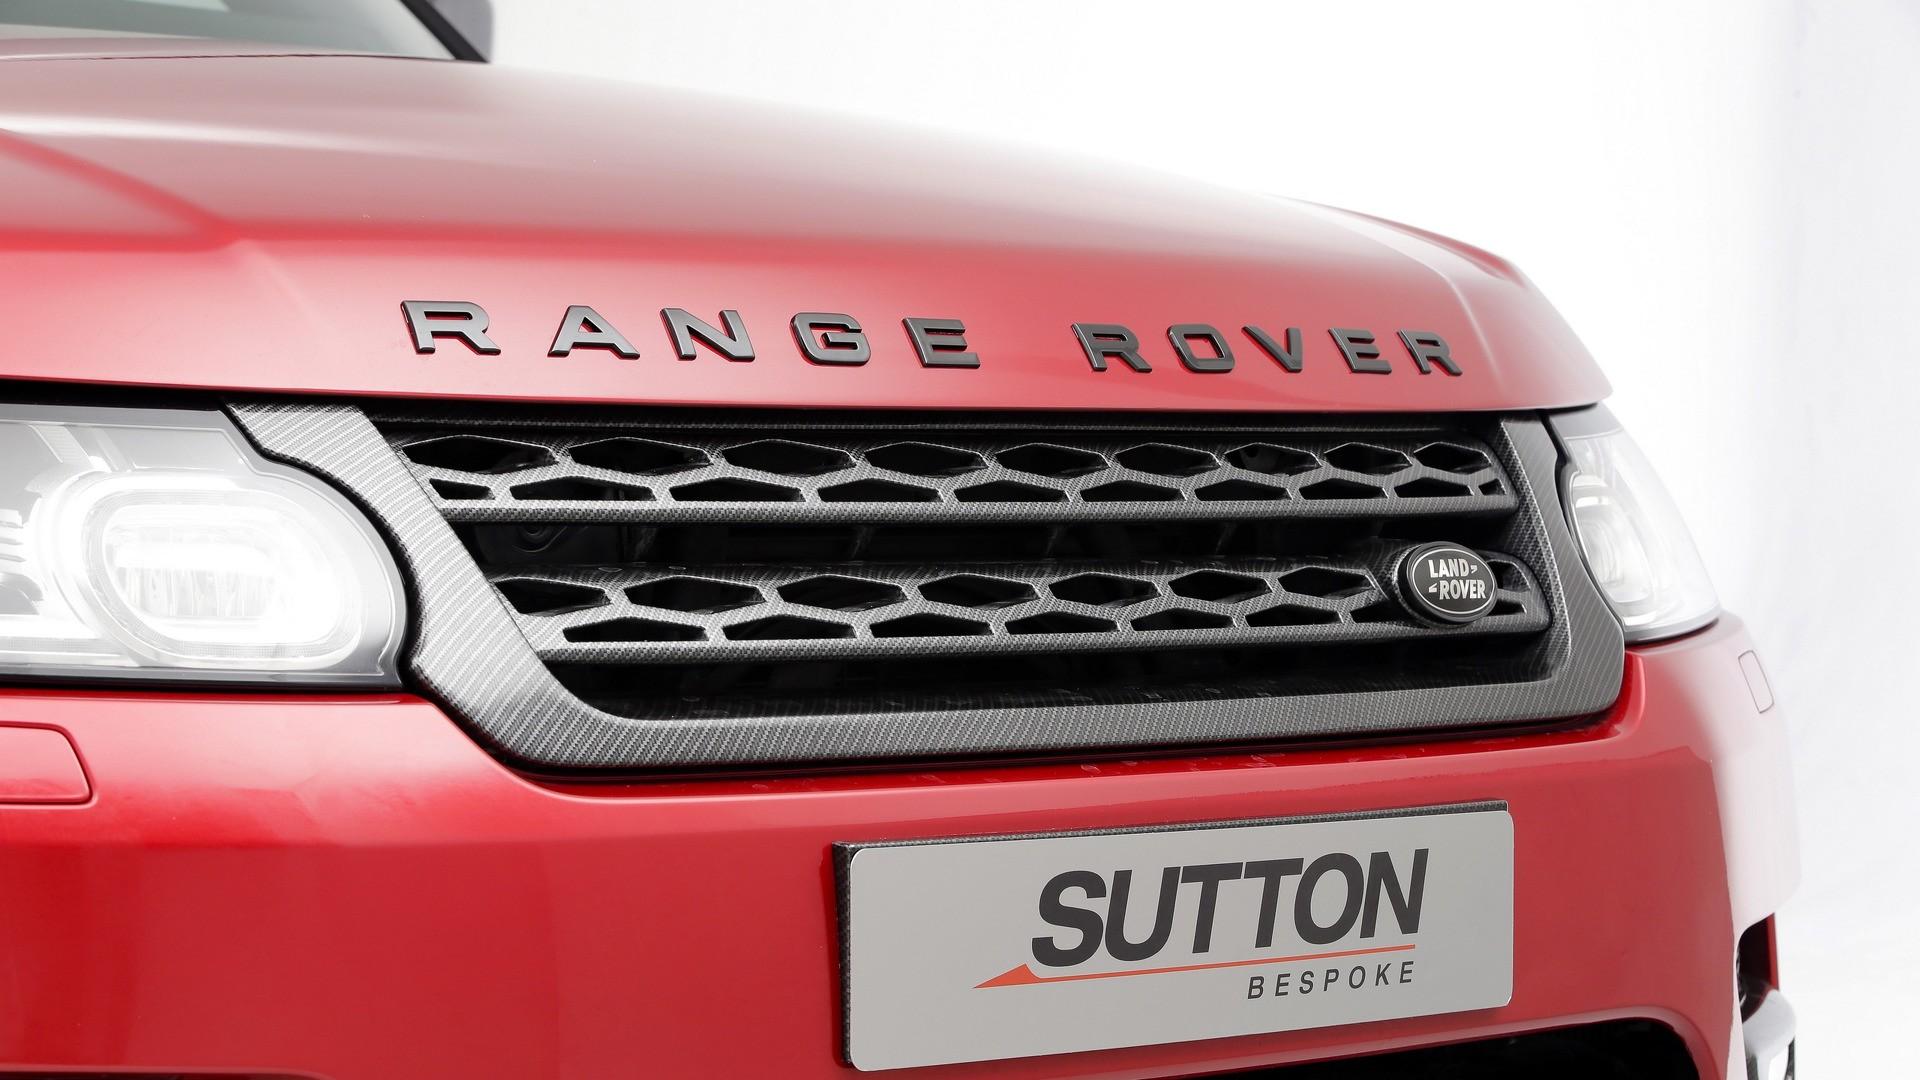 Clive Sutton Range Rover Sport 2017